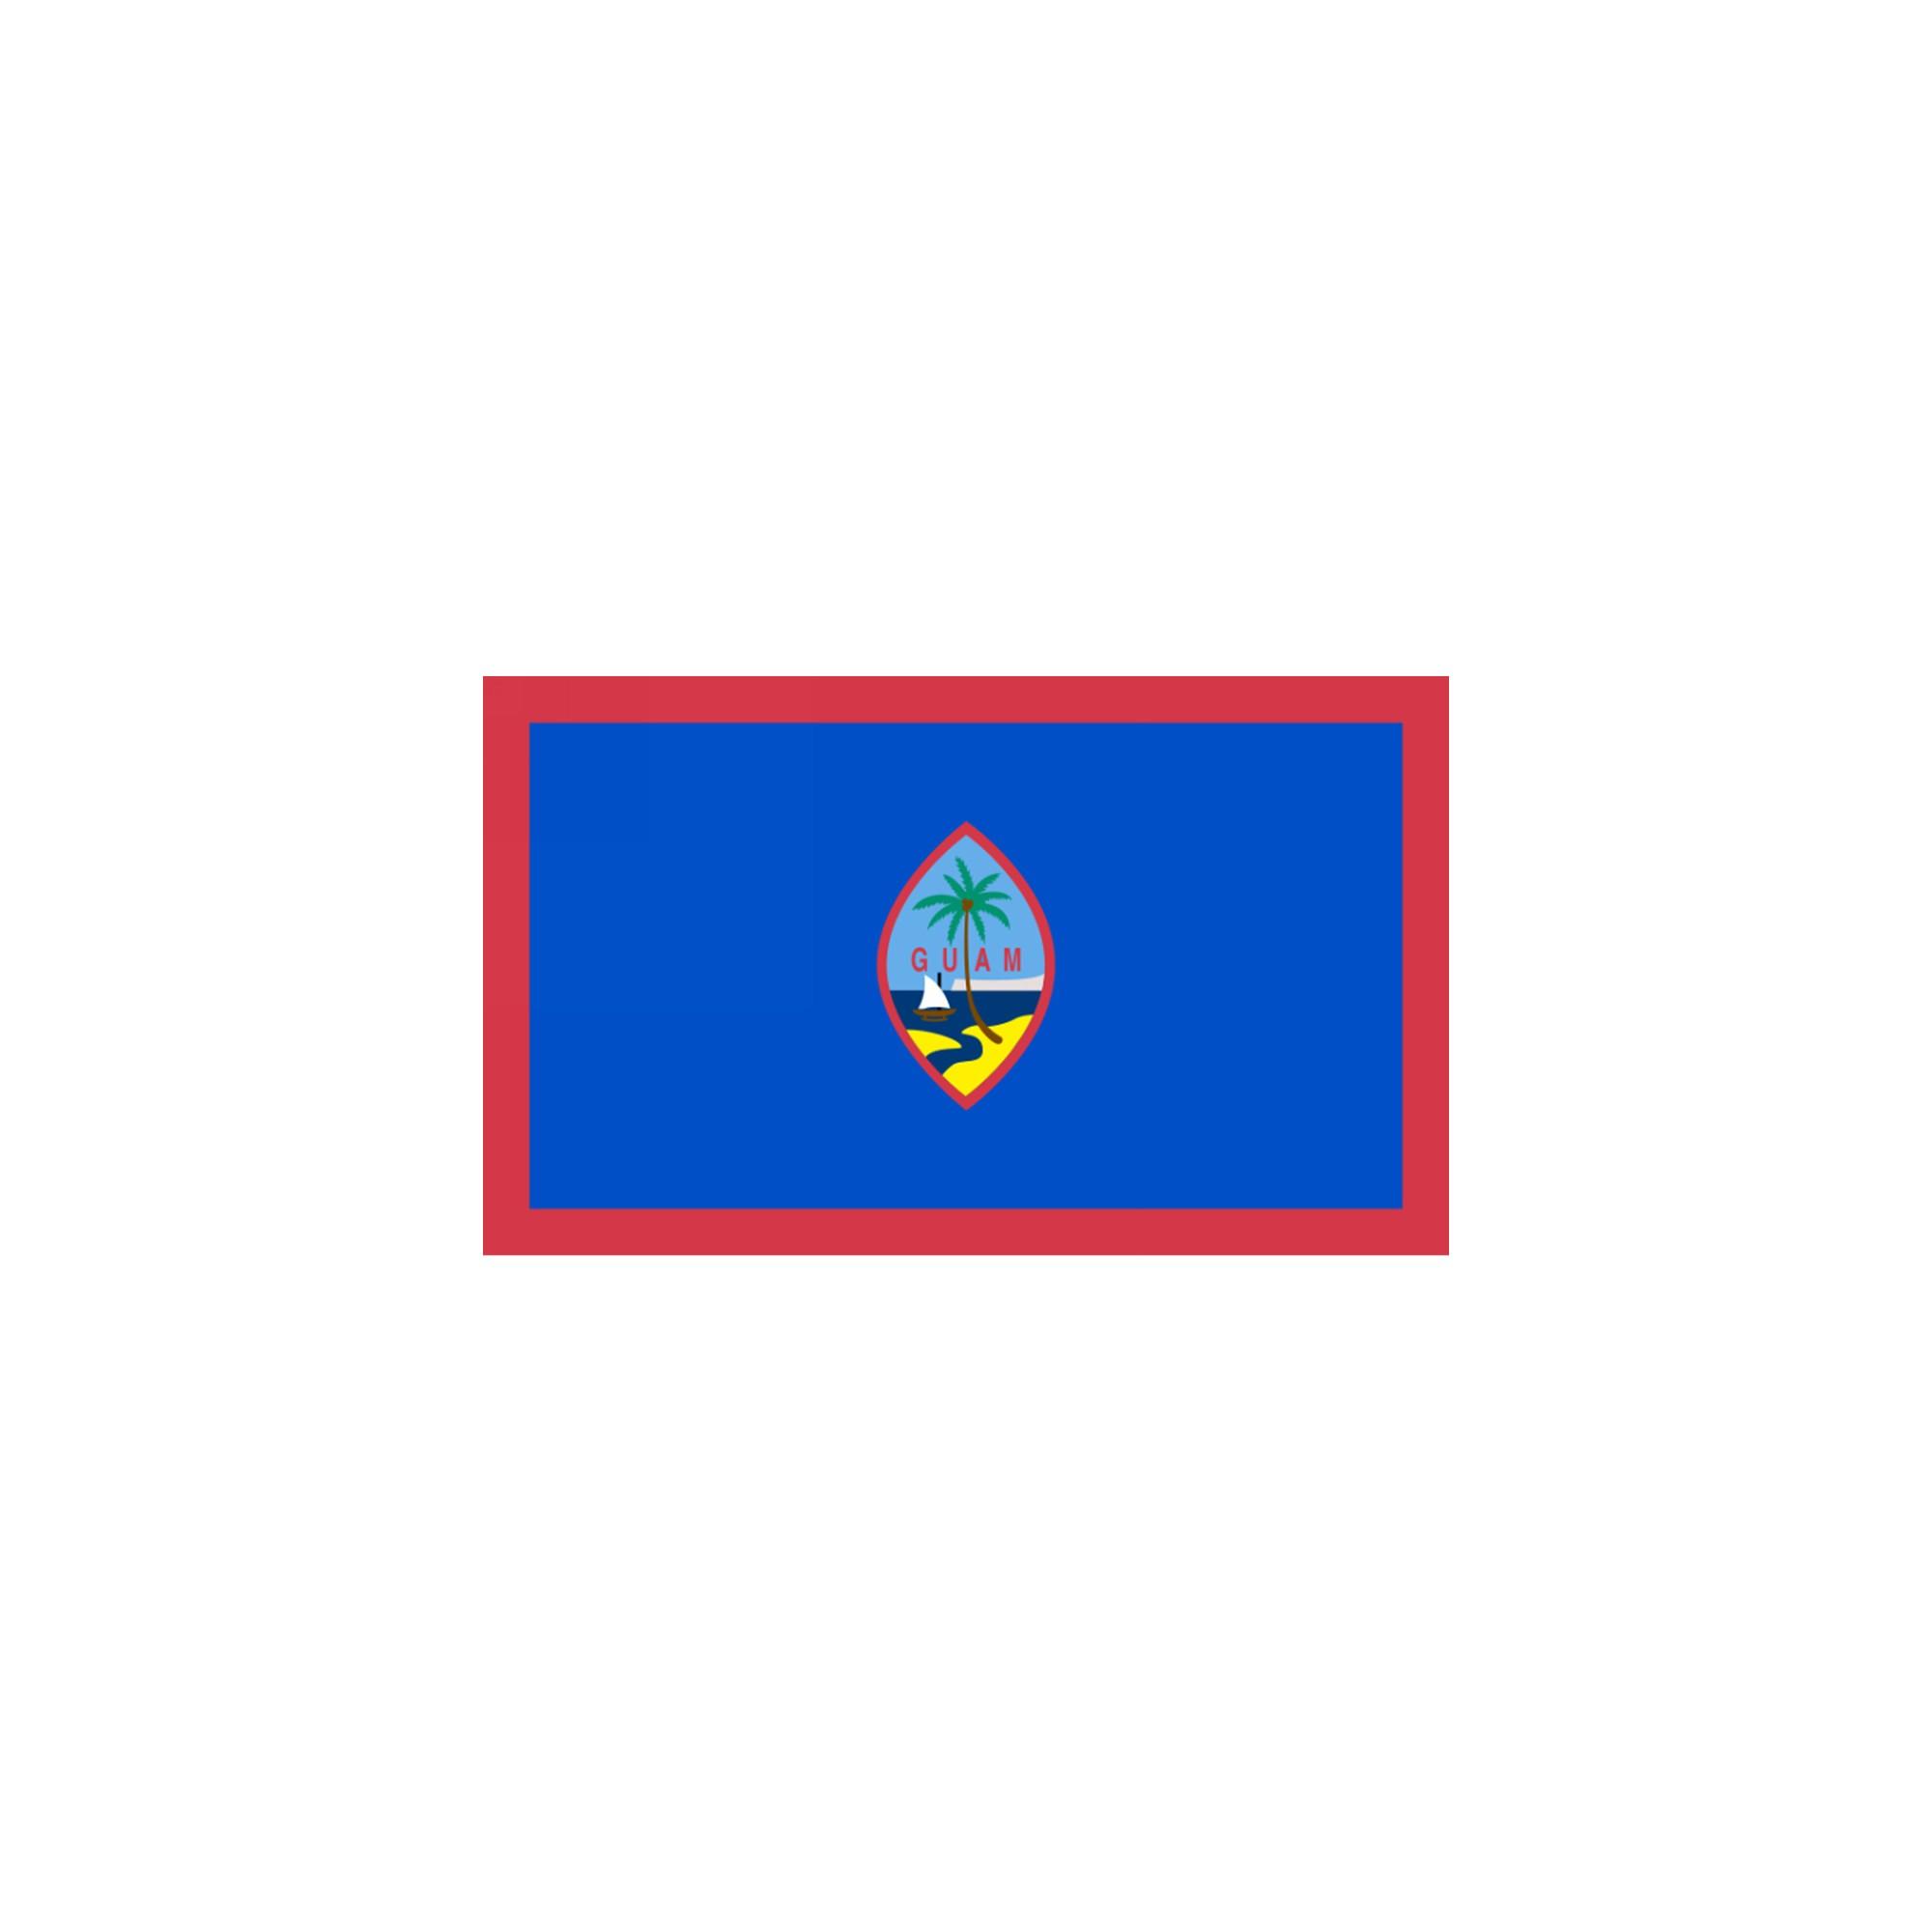 Halloween Guam Flag - 4' x 6', flags